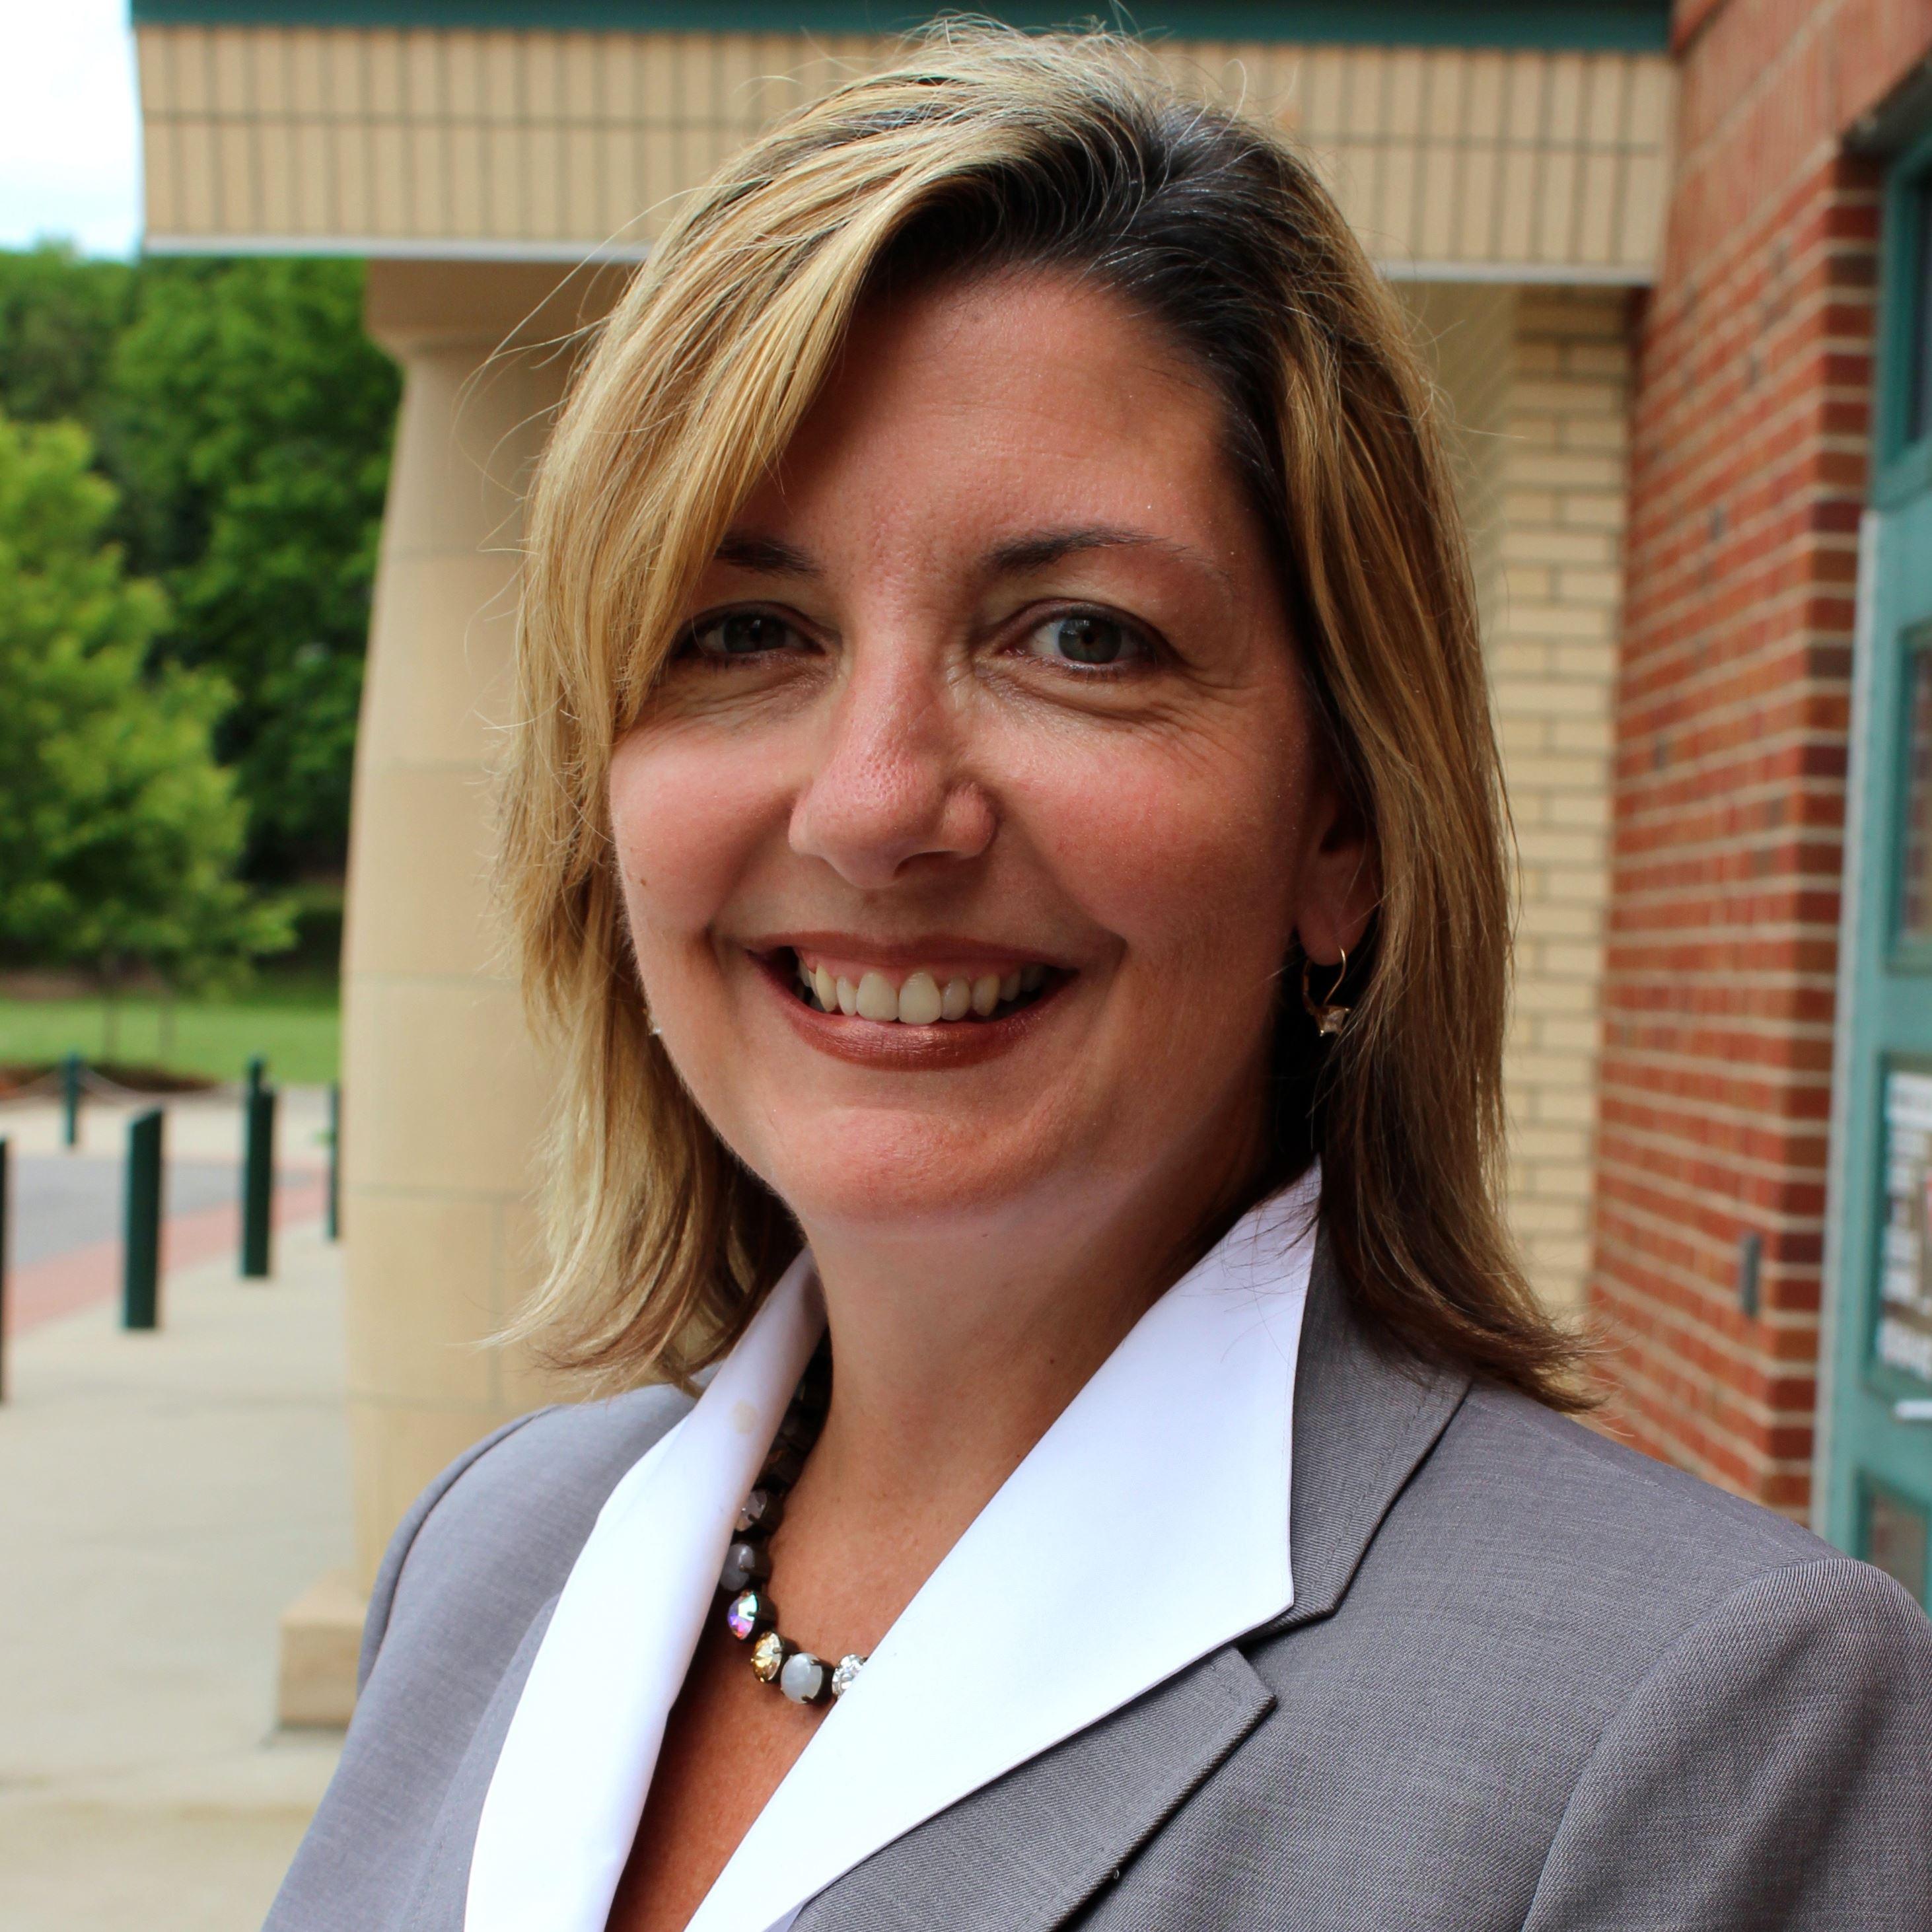 Quaker Valley Names New Superintendent